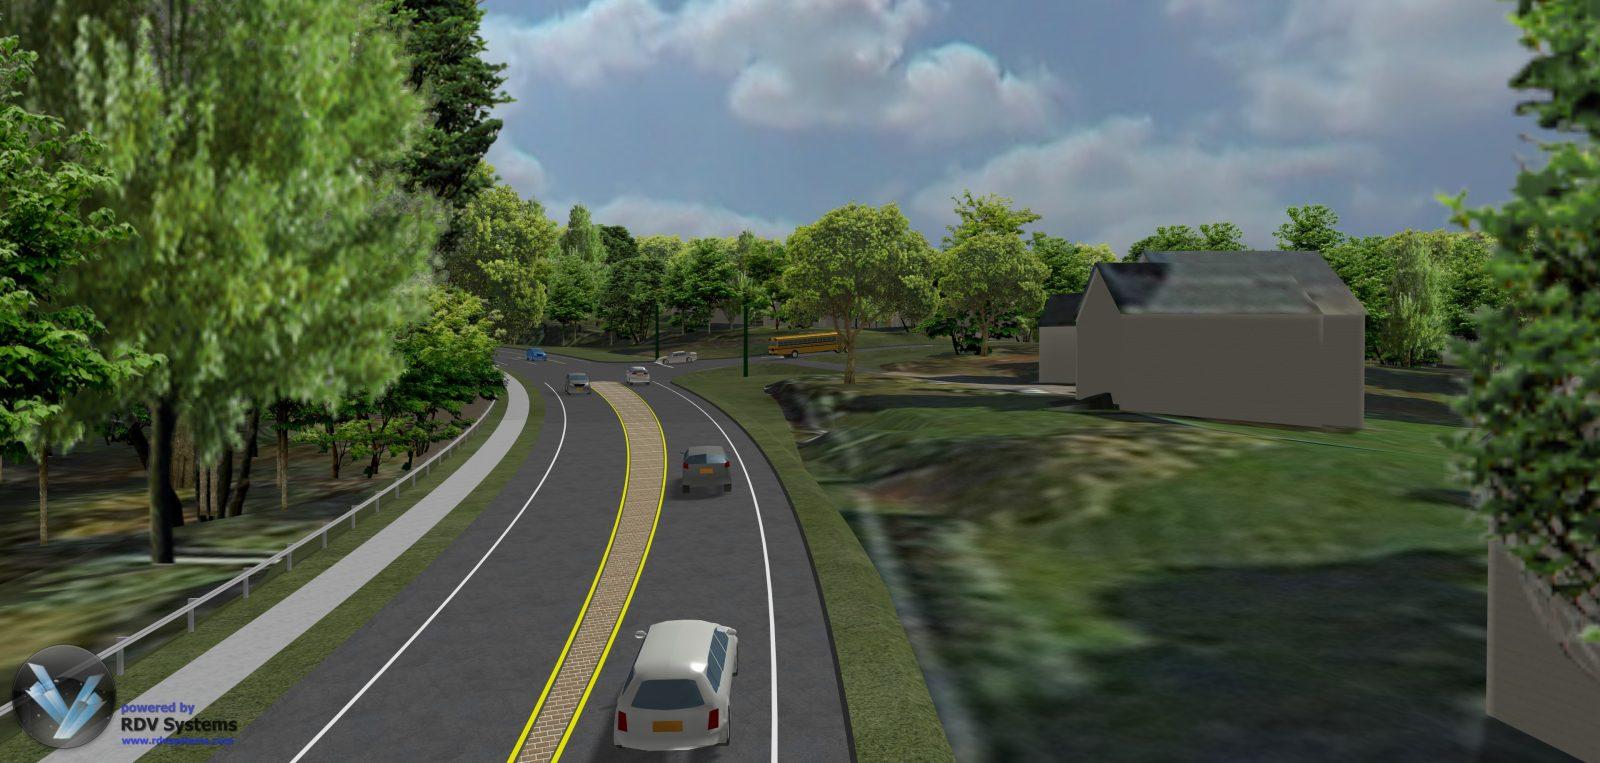 RDV Systems - Danbury Route 37 4